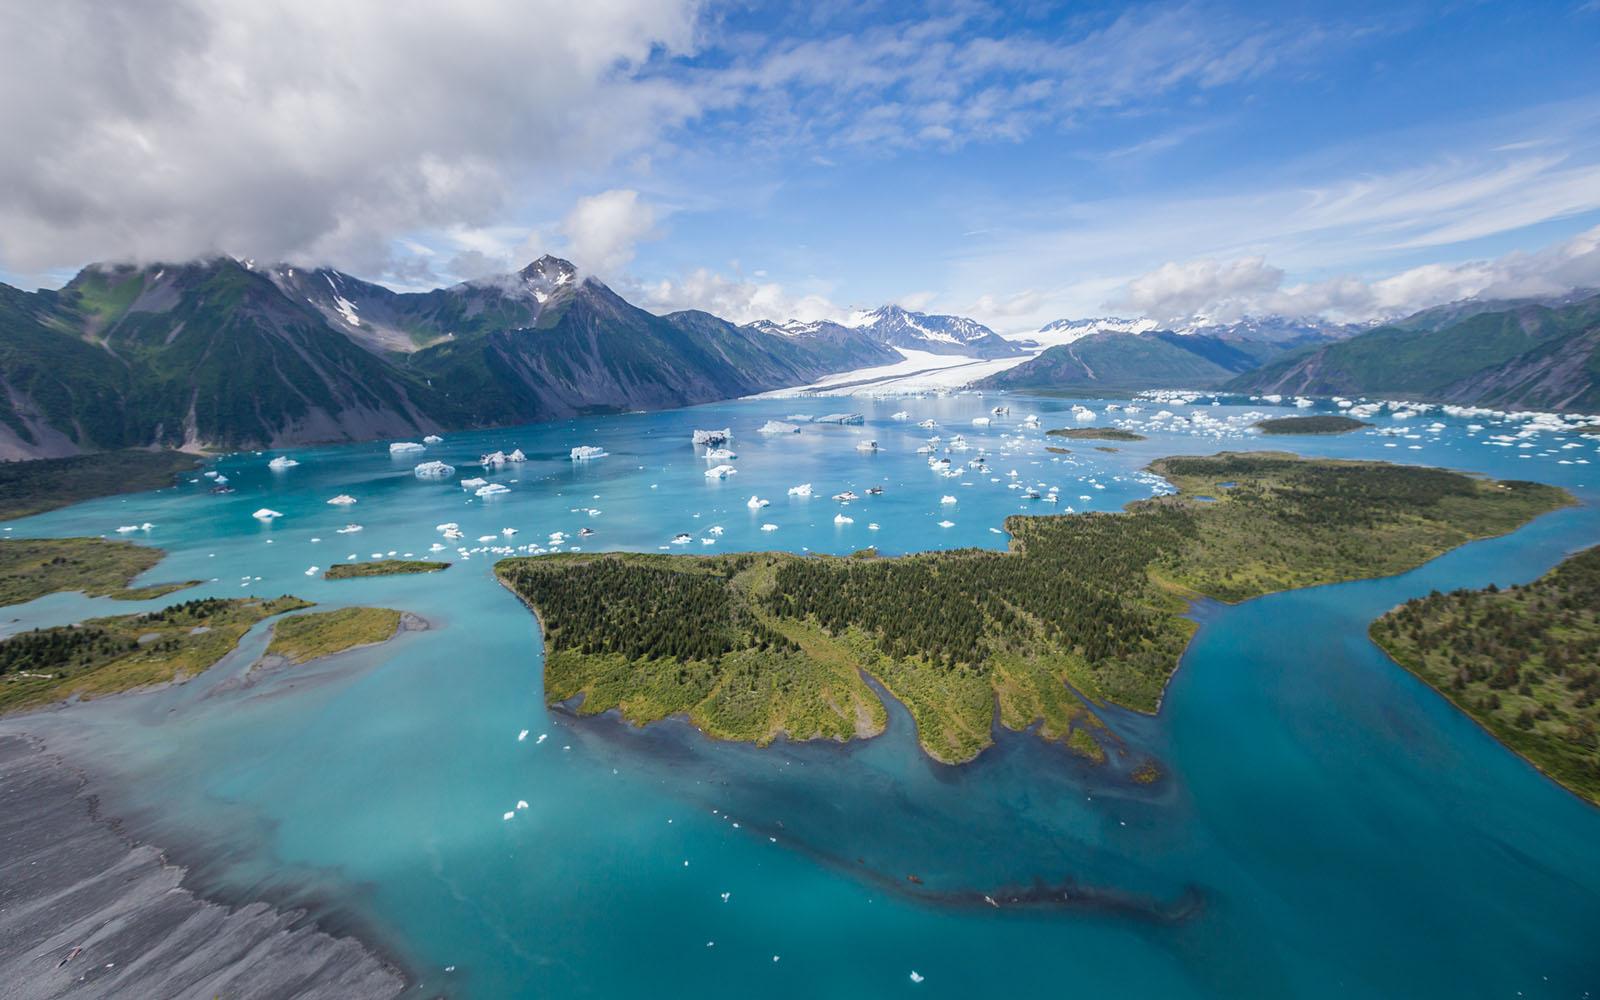 2014, 2015, Alaska, adventure, aerial, art, artist, backcountry, beautiful, custom, denali, exit glacier, fine art, helicopter...